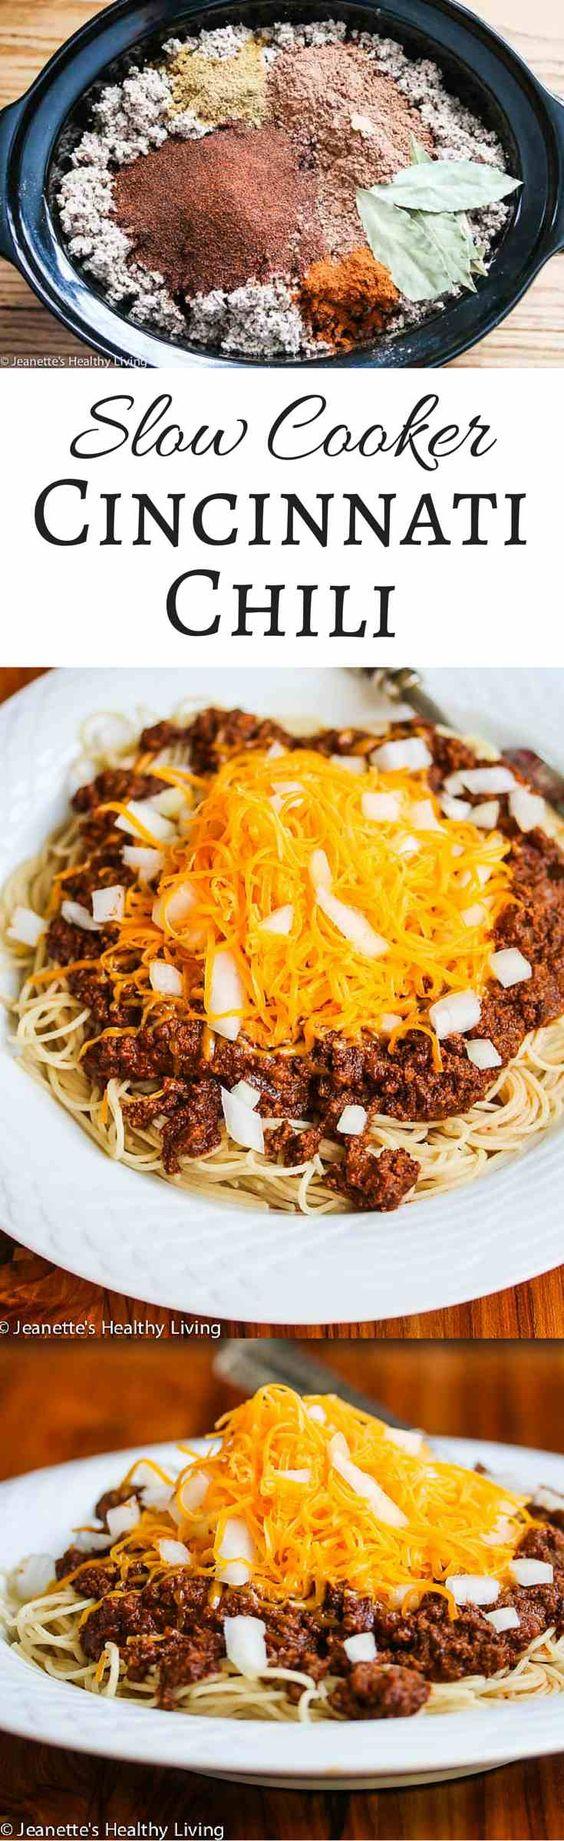 Cincinnati Chili | Recipe | Cincinnati Chili, Cincinnati and Chili